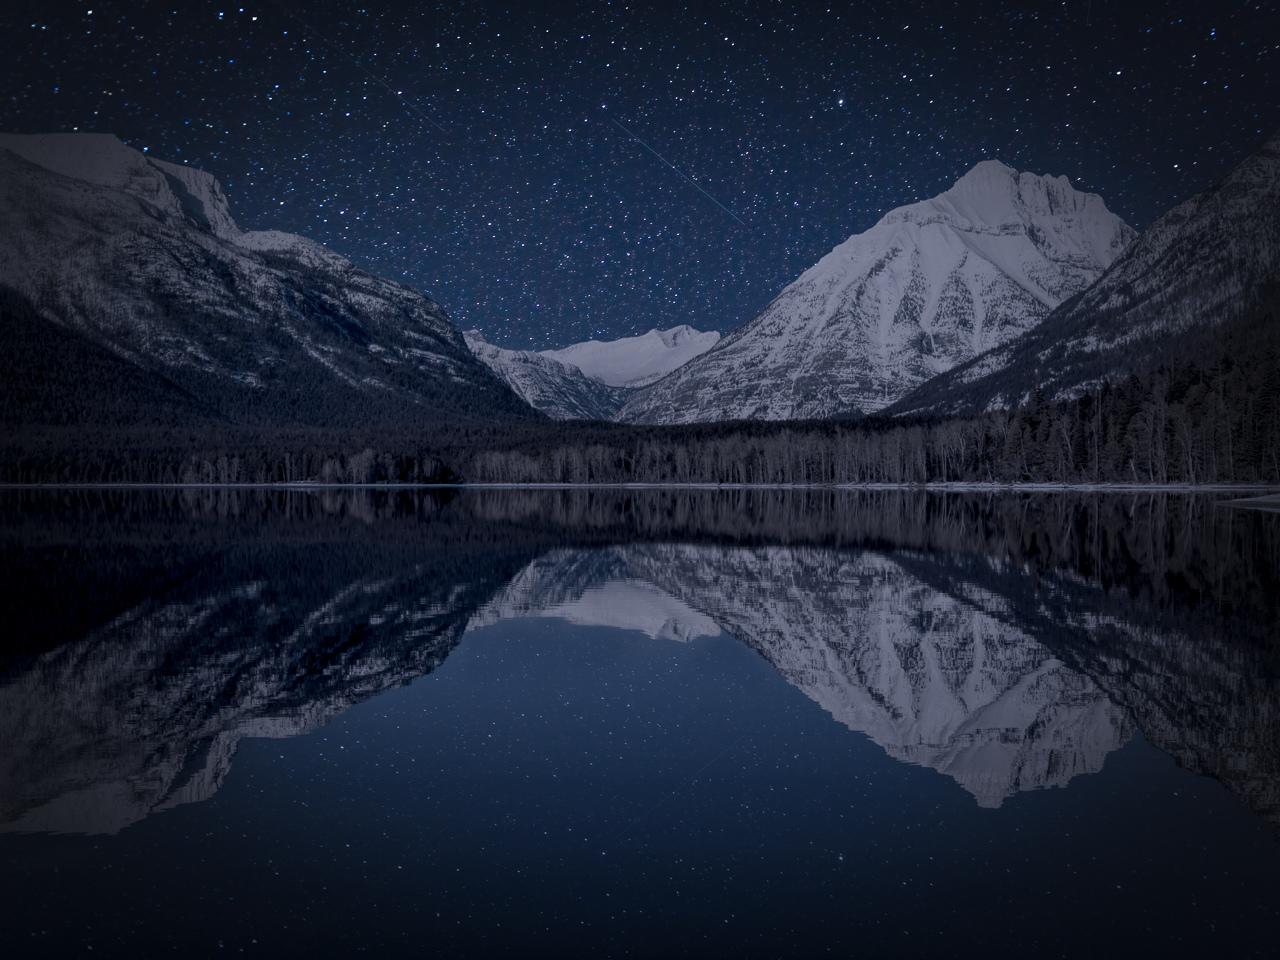 Starry, Starry Night- Melissa Anderson - WWPC